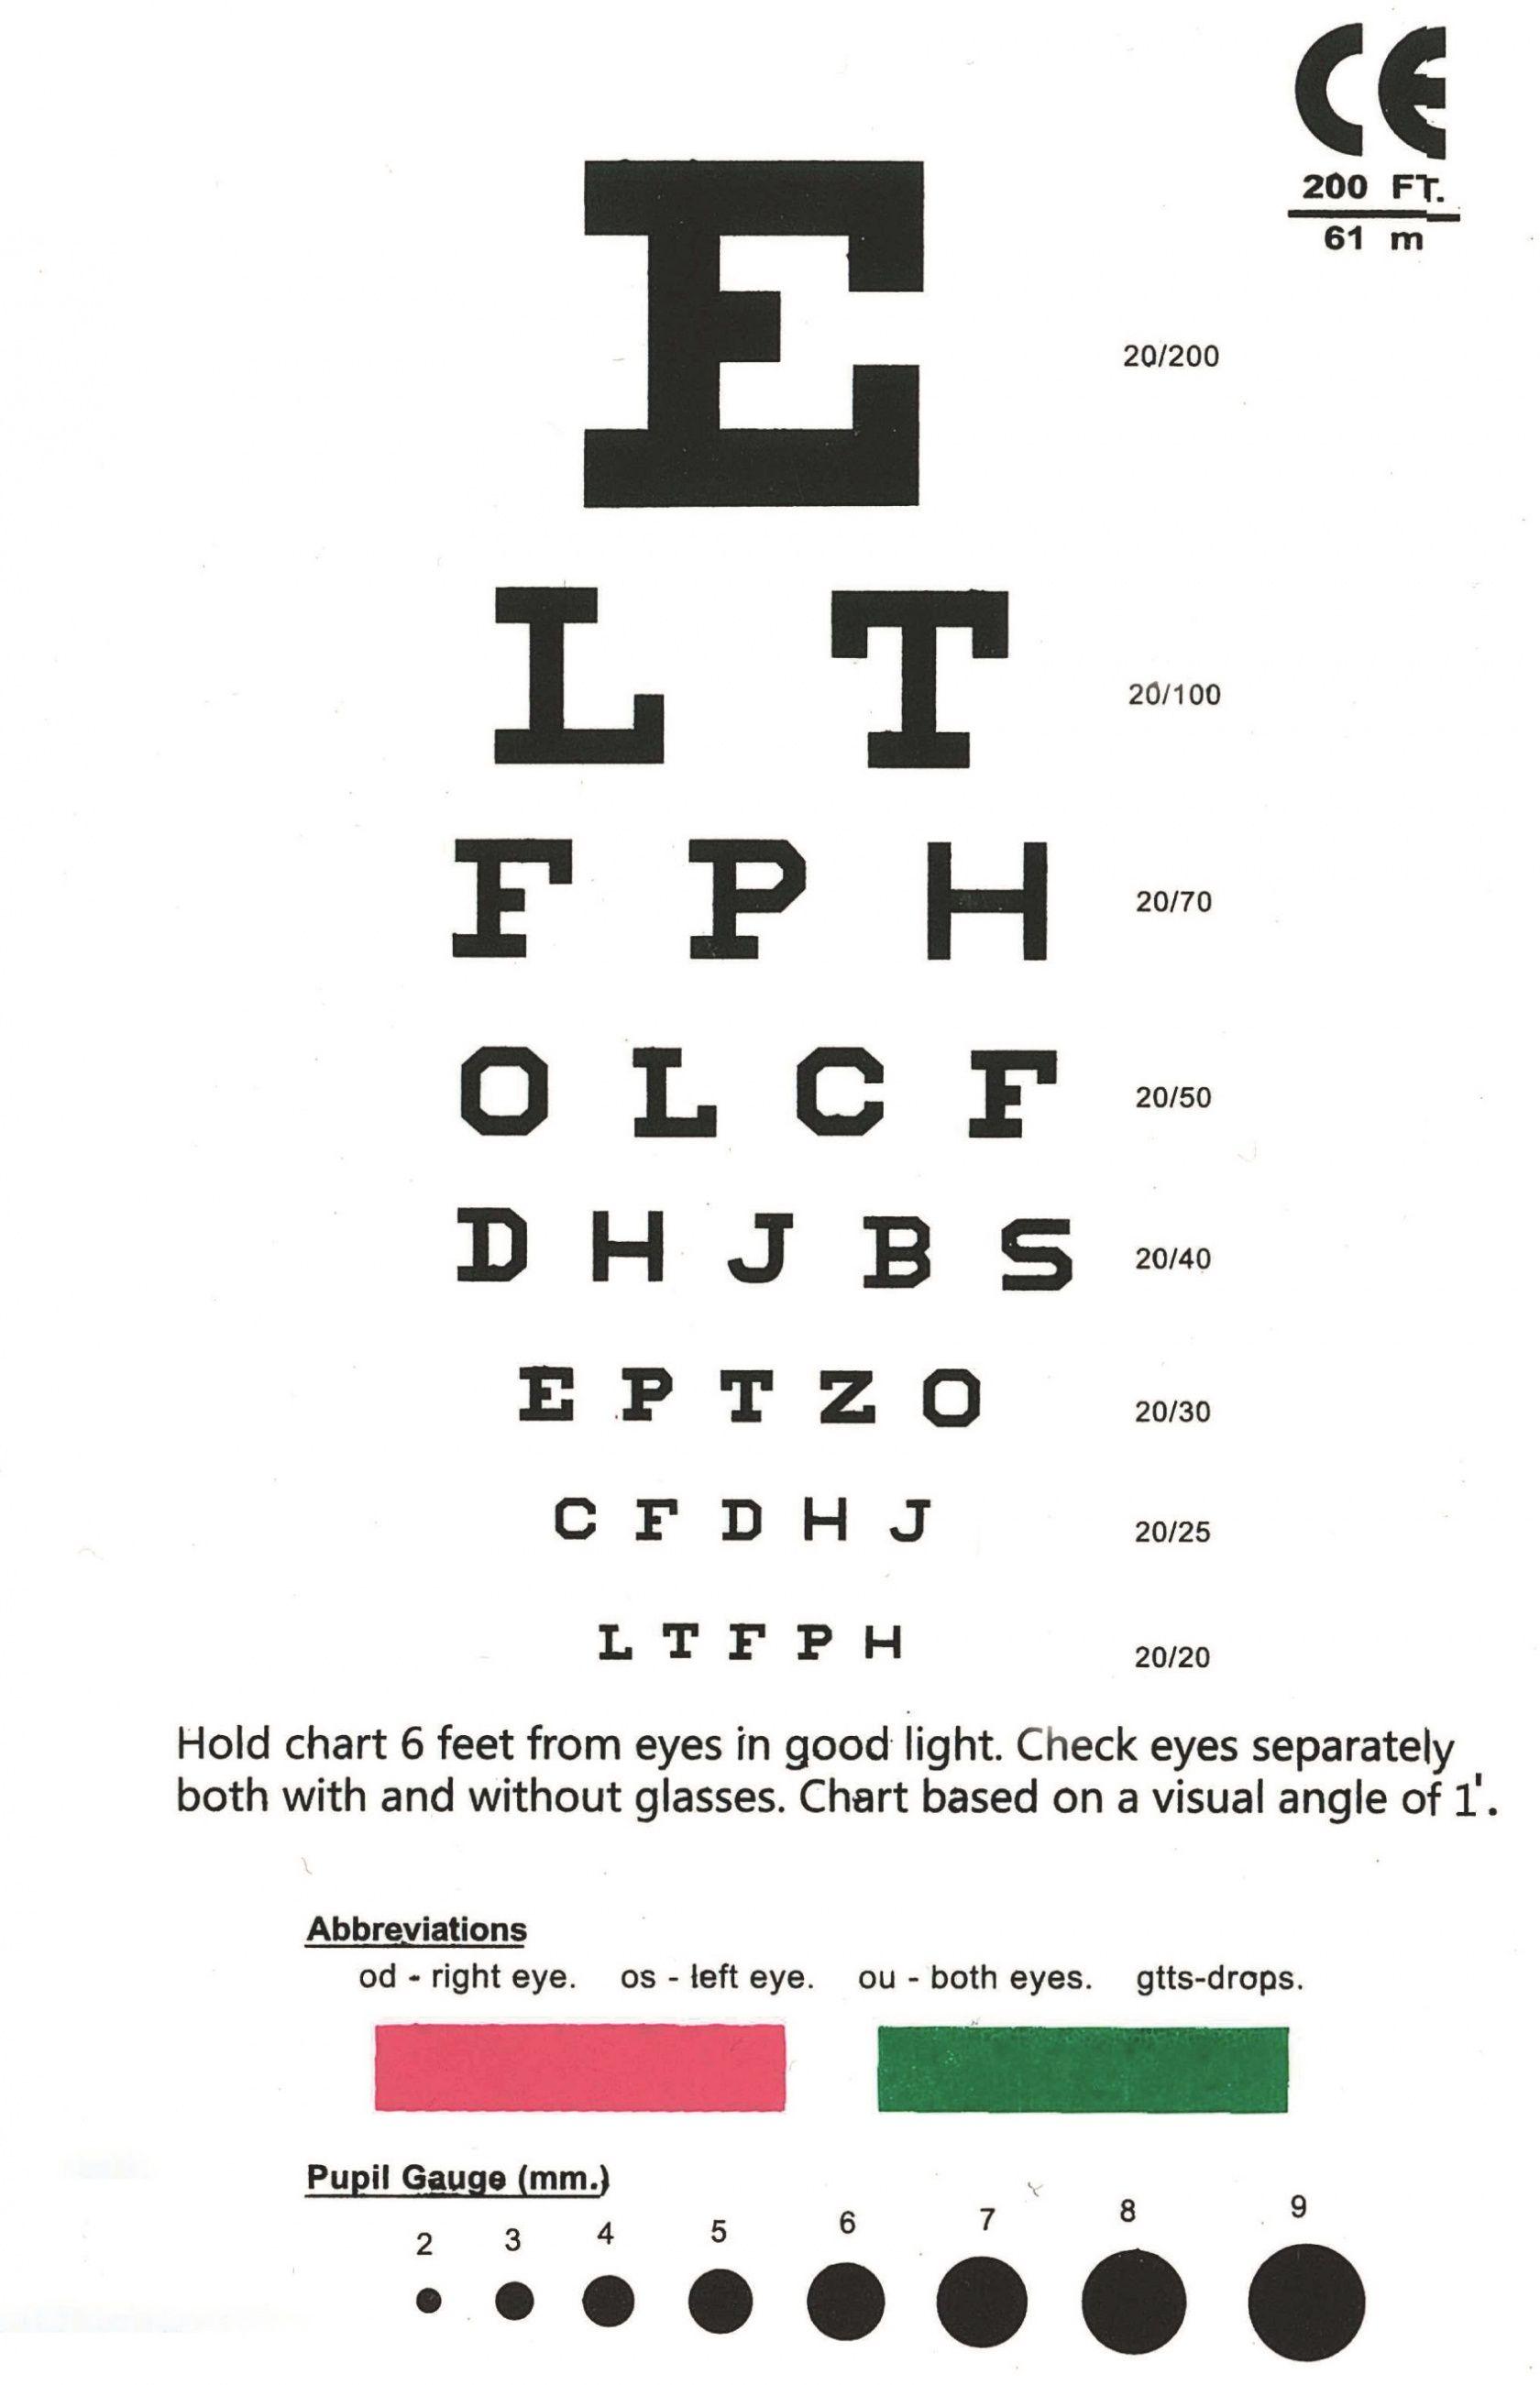 picture regarding Rosenbaum Chart Printable called Printable Pocket Visible Acuity Chart - Eye chart snellen